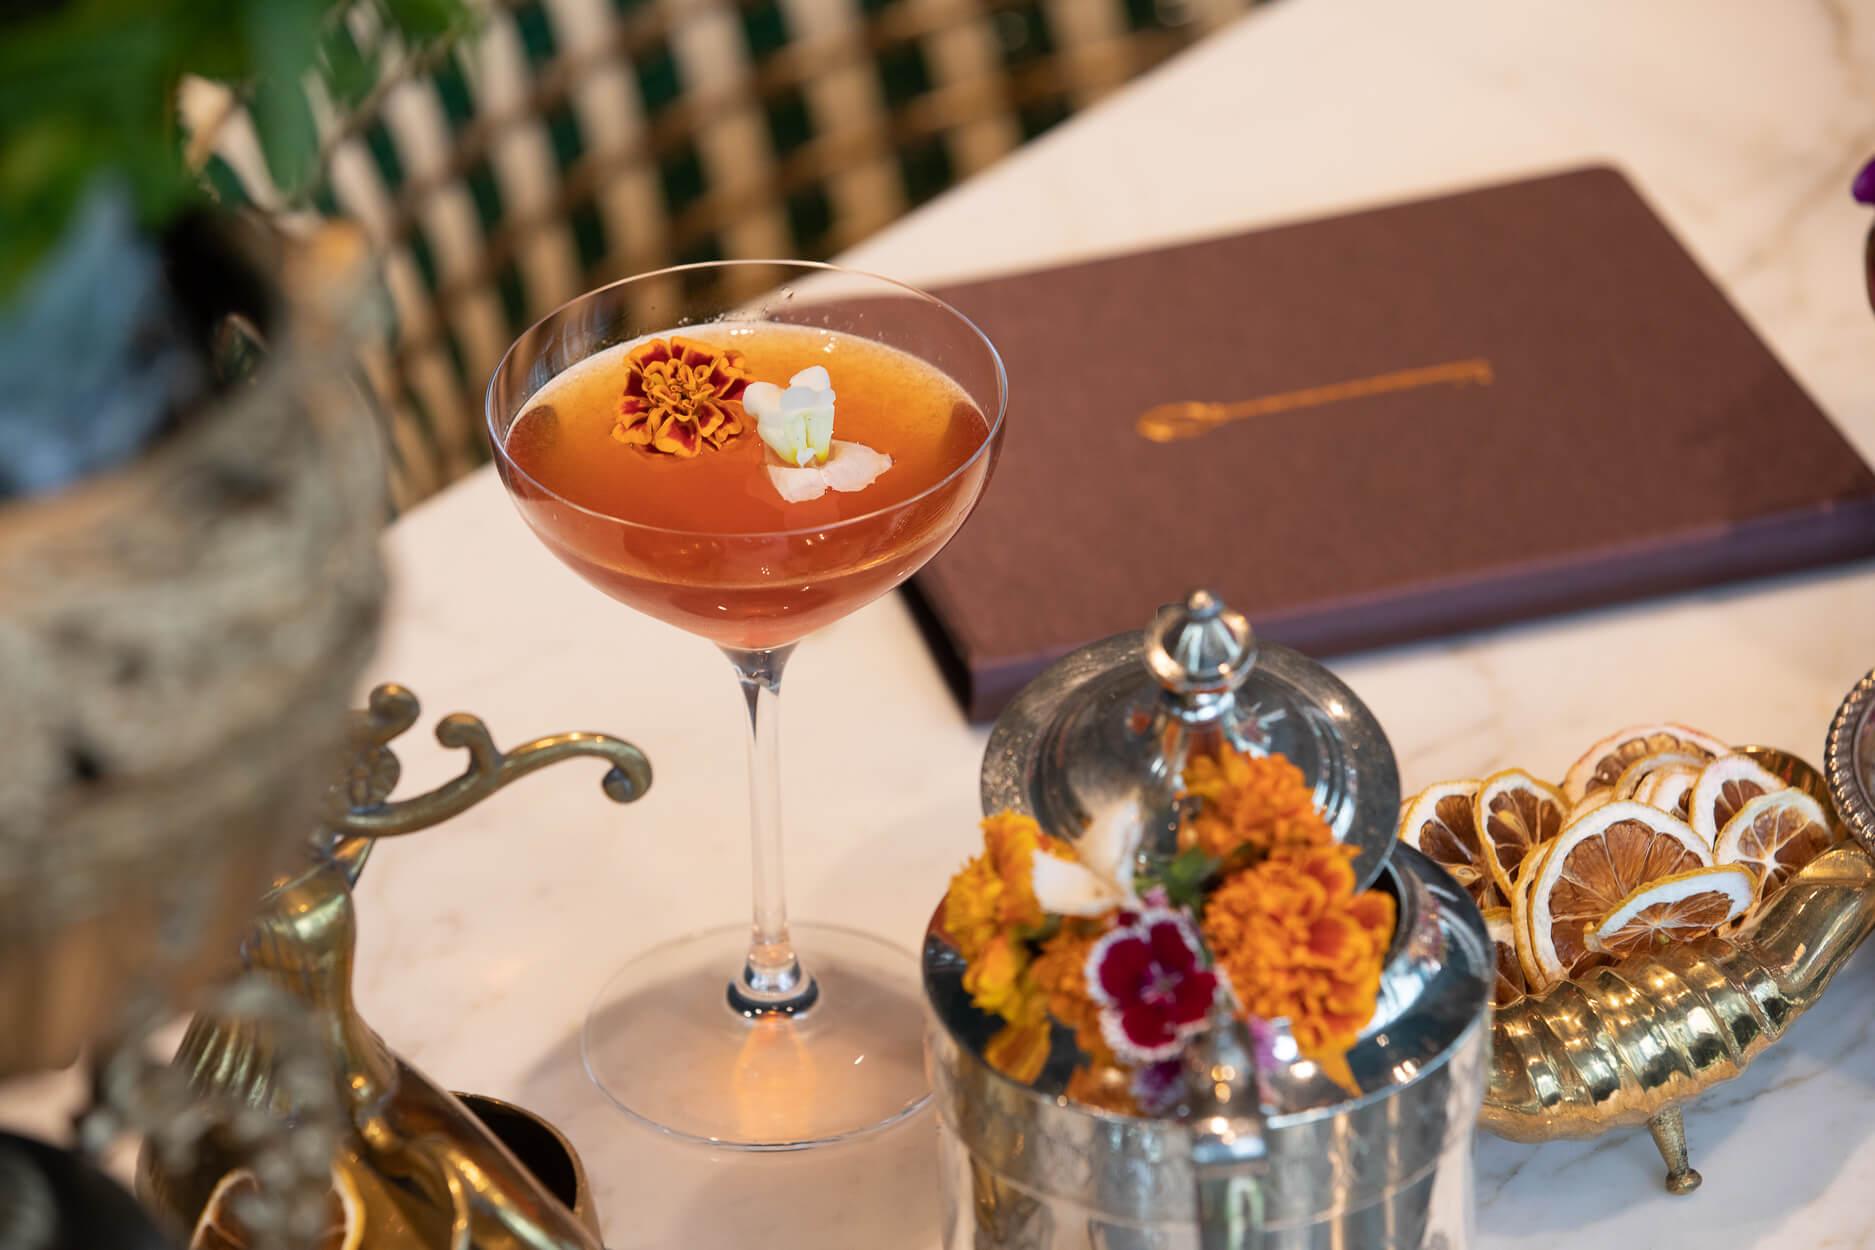 Dark orange cocktail garnished with edible flowers, sitting on the bar at Alchemy in Edmonton